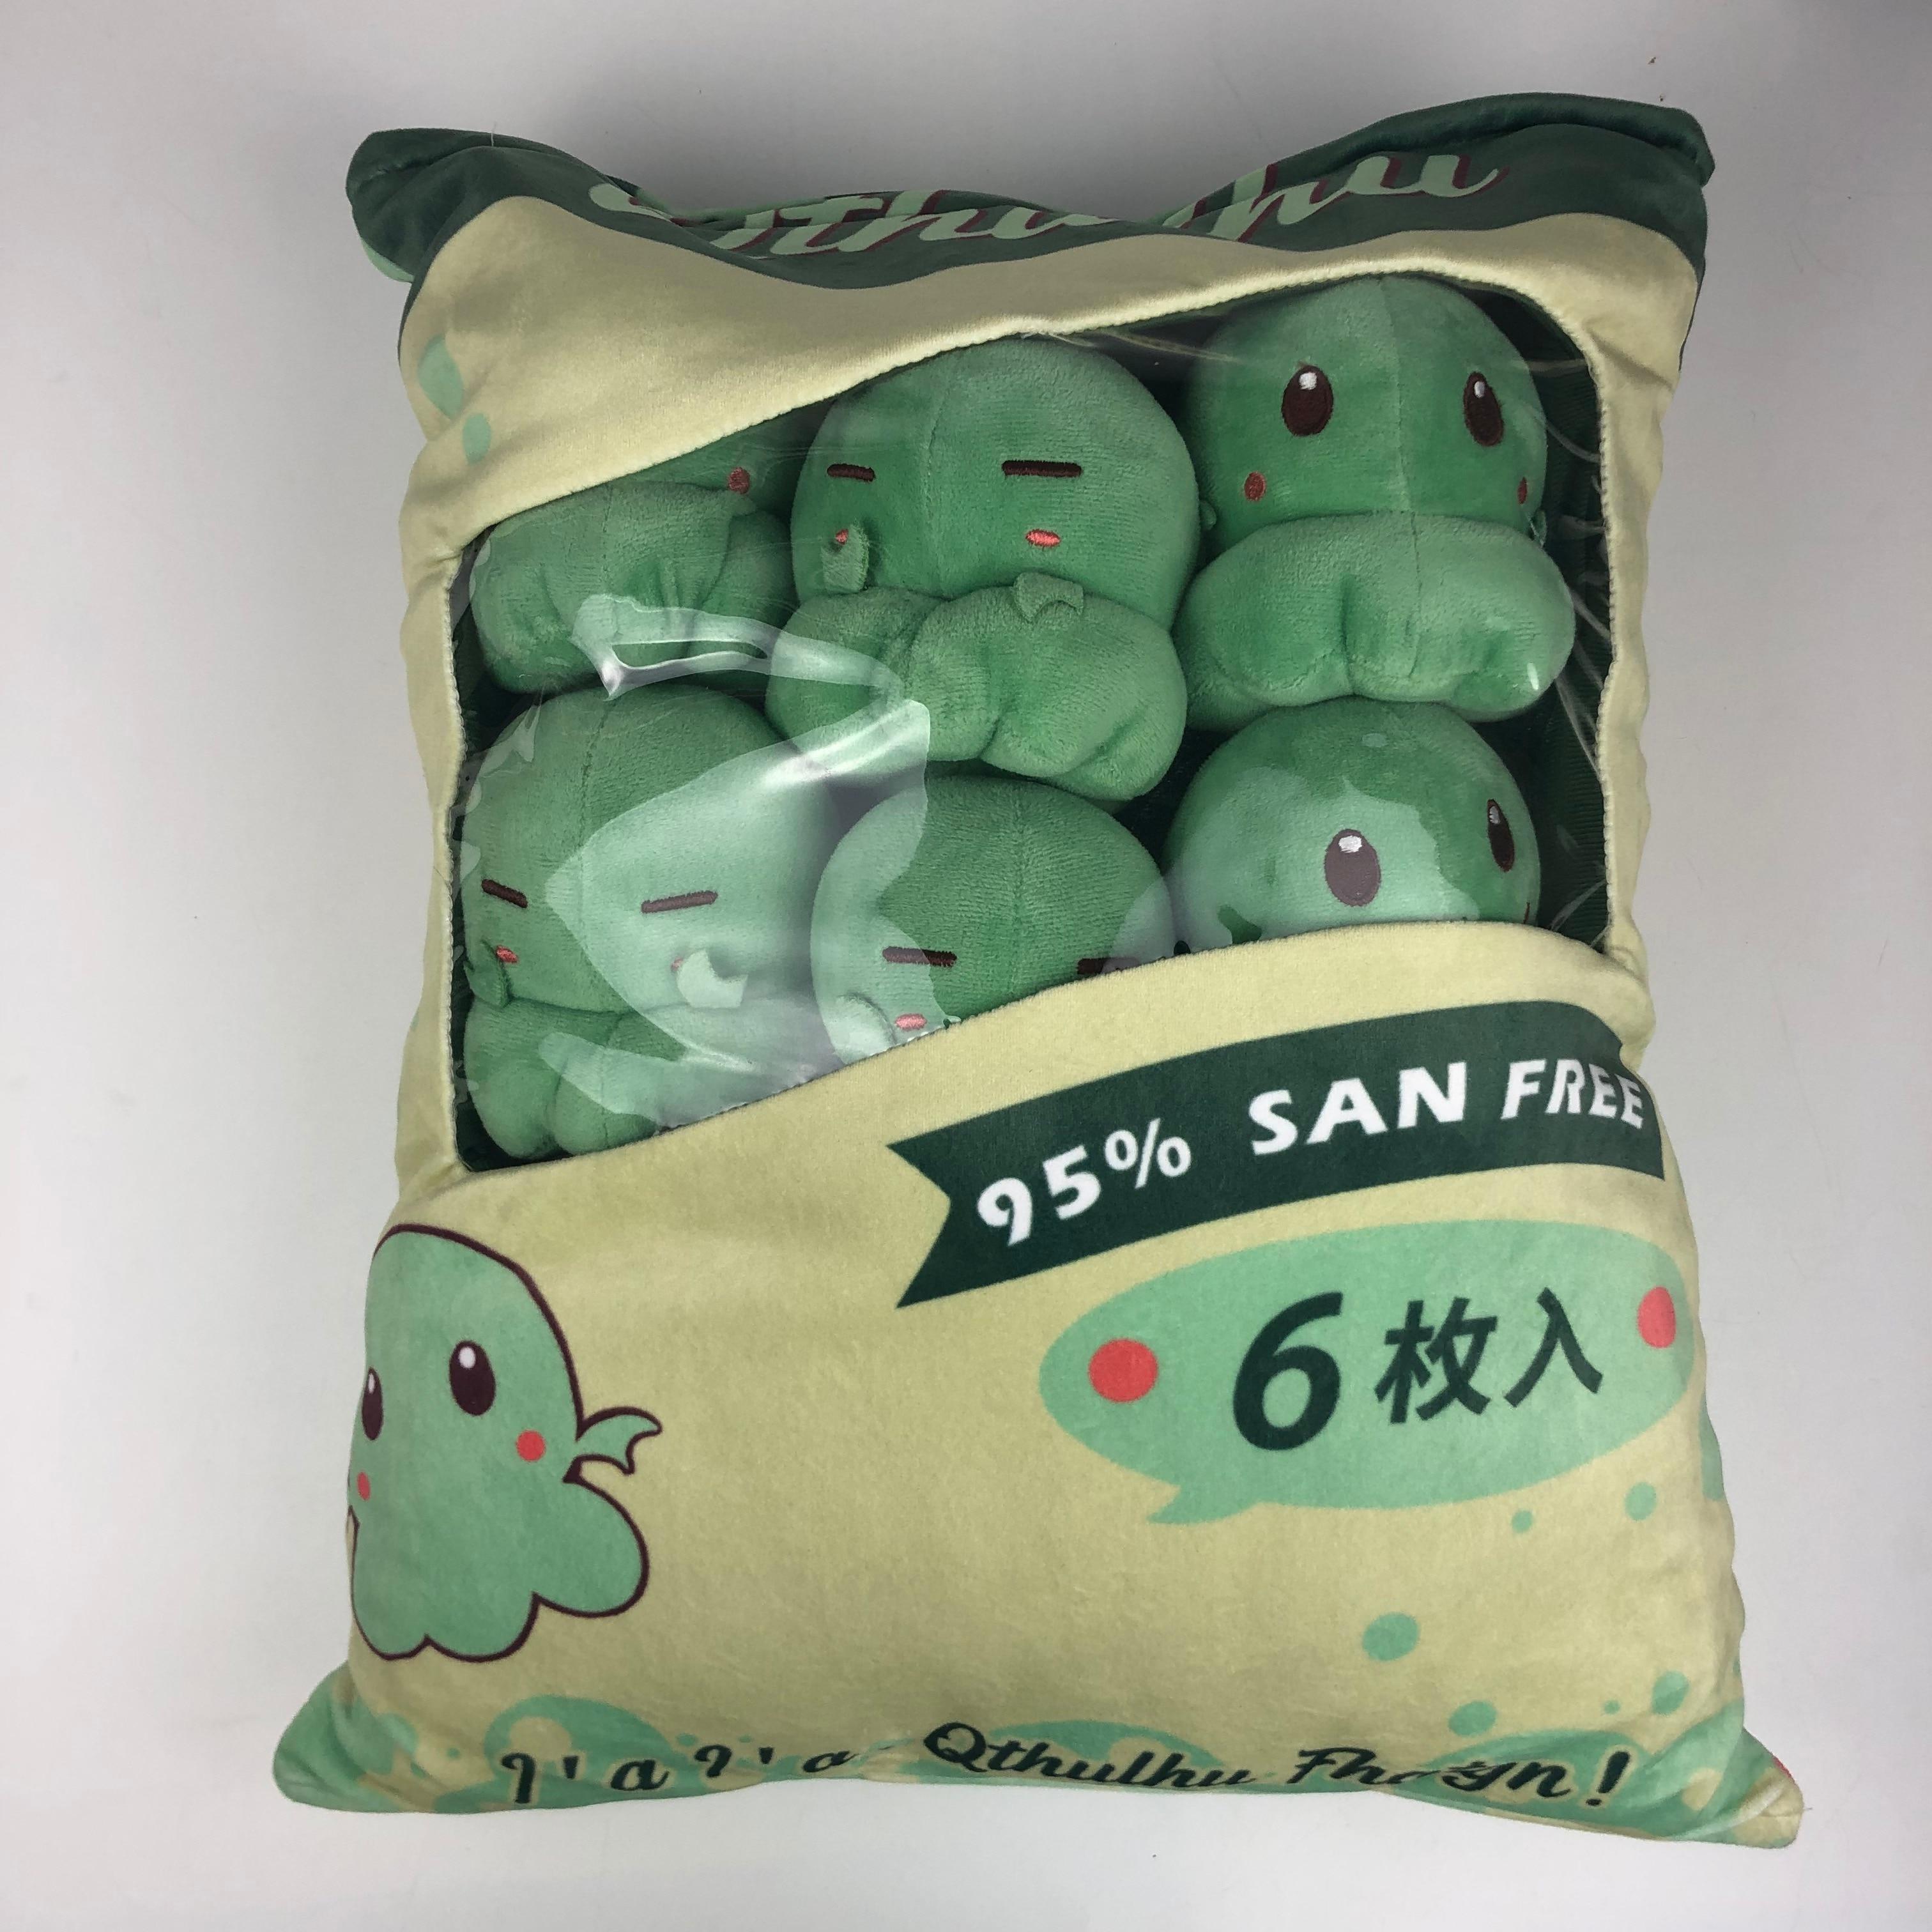 Cthulhu Mythos Cthulhu Soft Plush Doll Toys 6pcs Pillow Cushion Stuffed Cute N